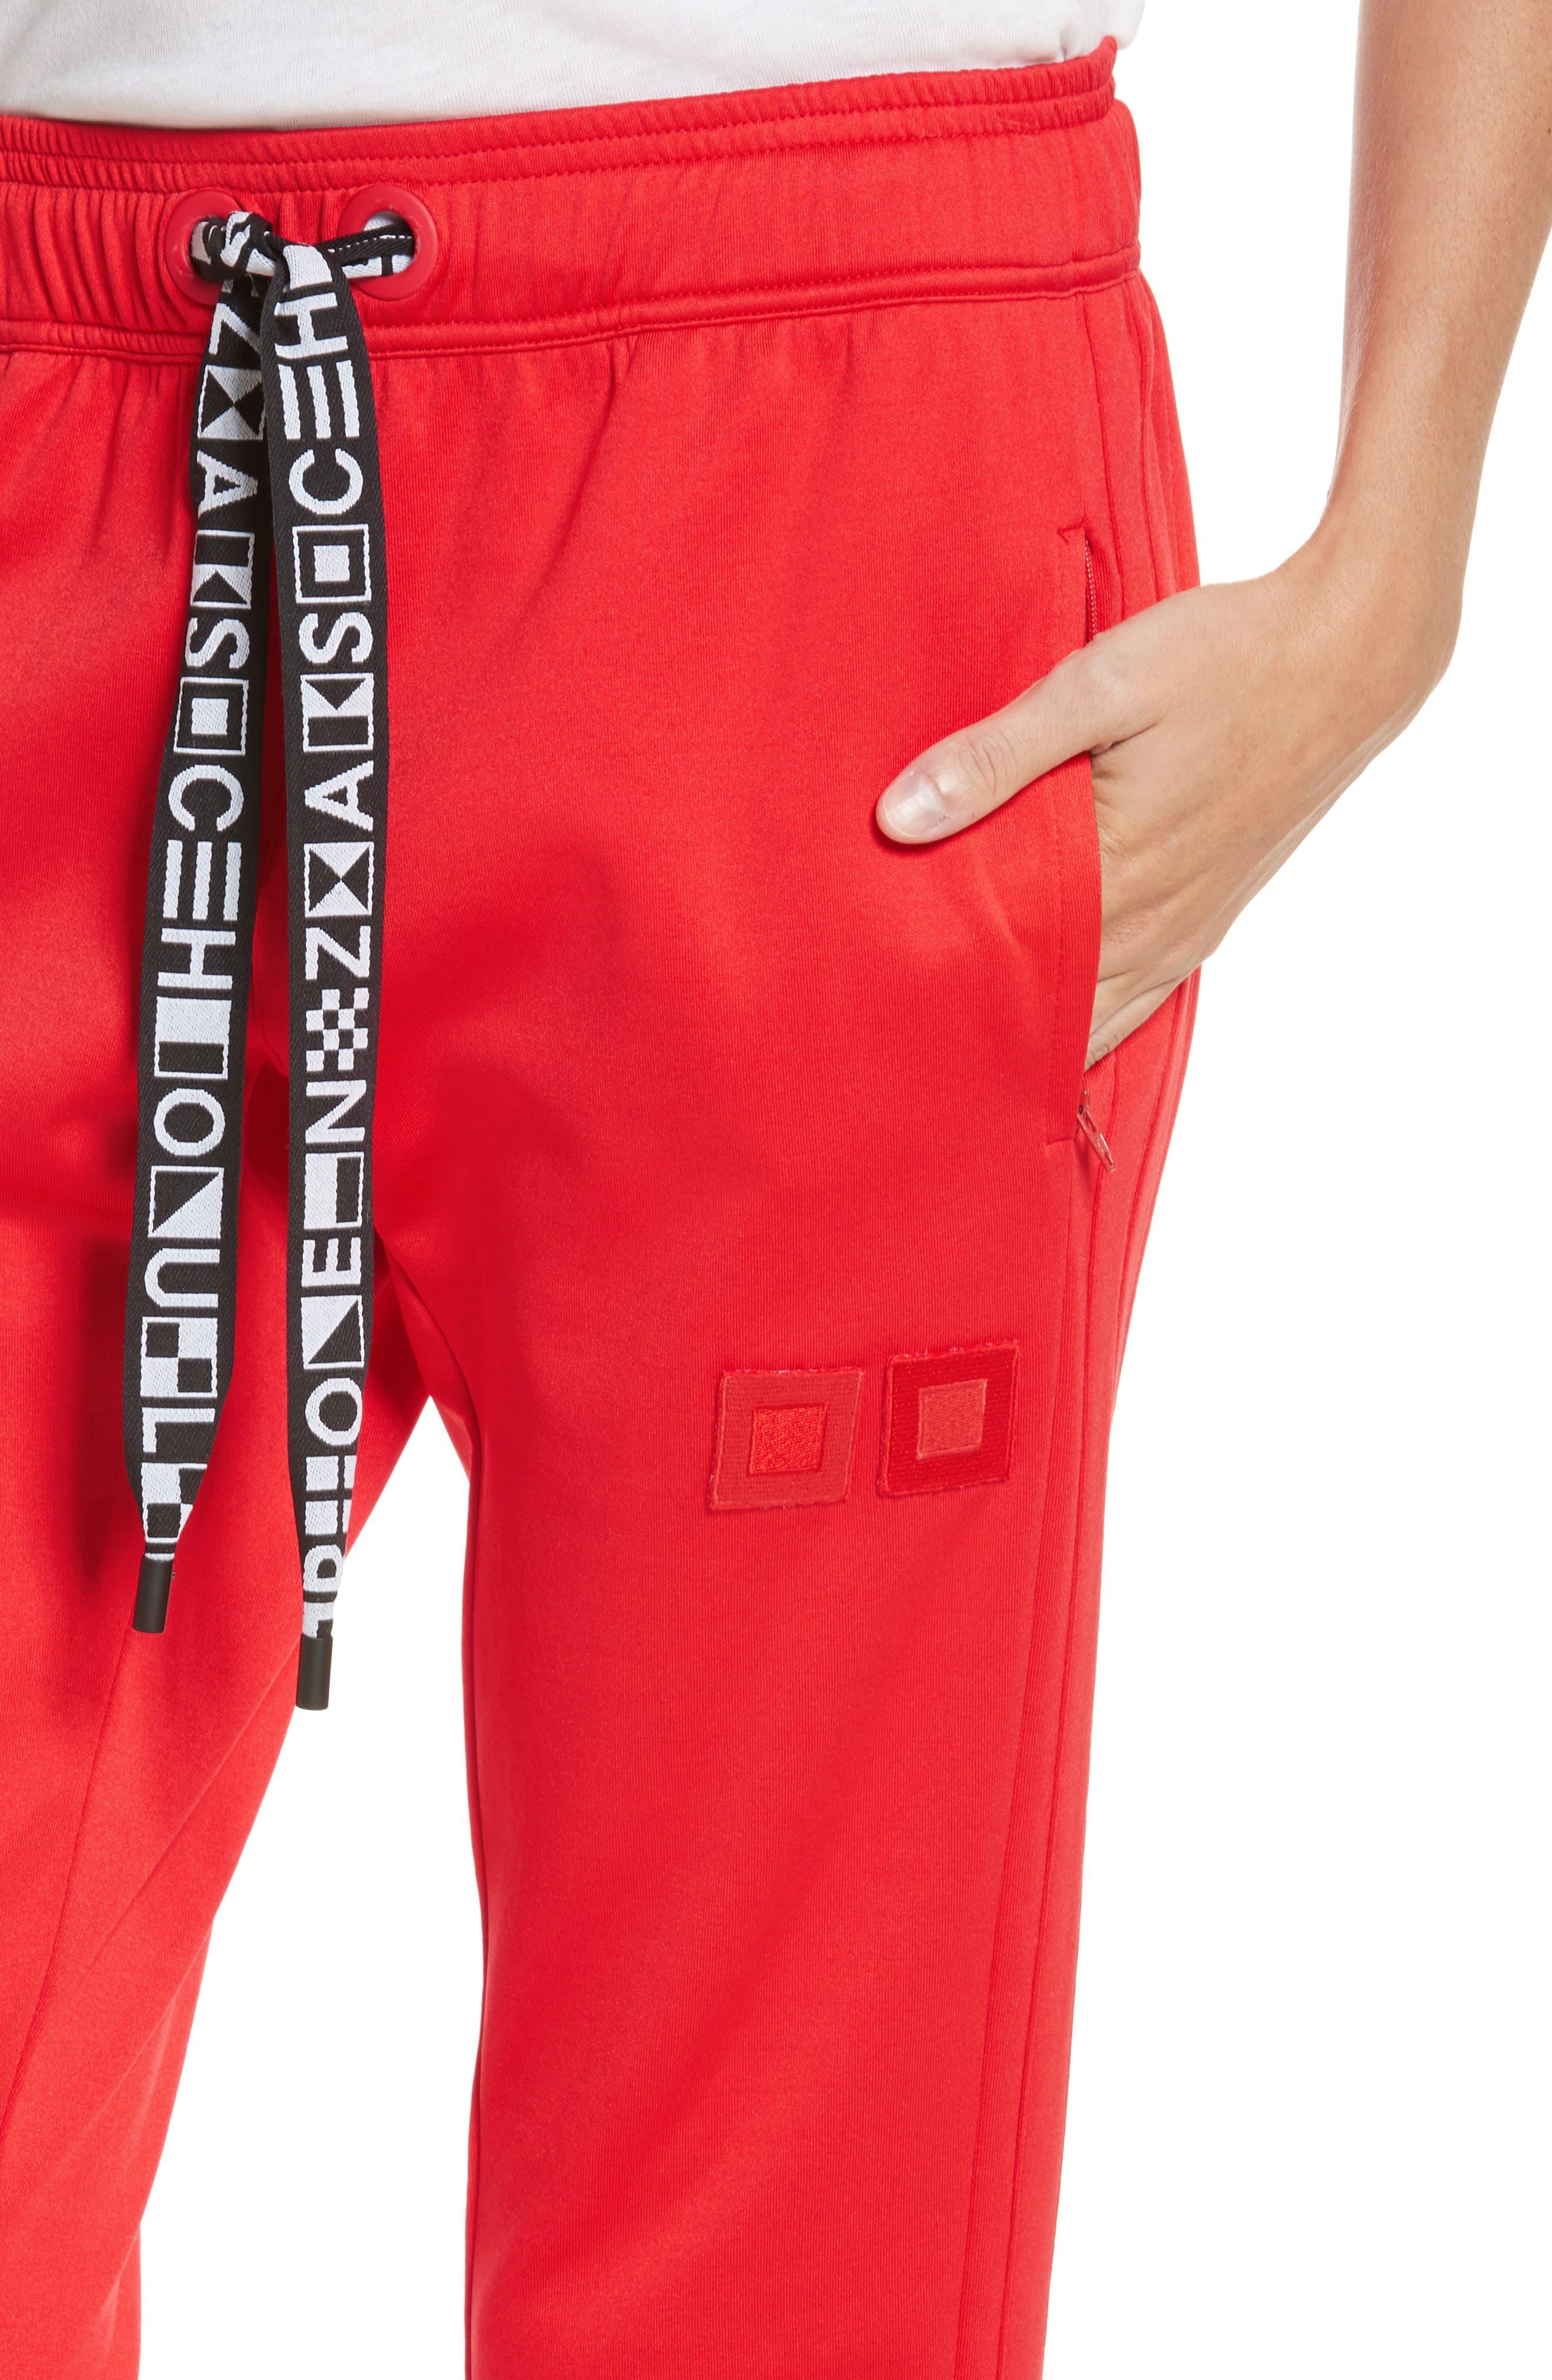 PSWL Jersey Track Pants,                             Alternate thumbnail 6, color,                             Poppy